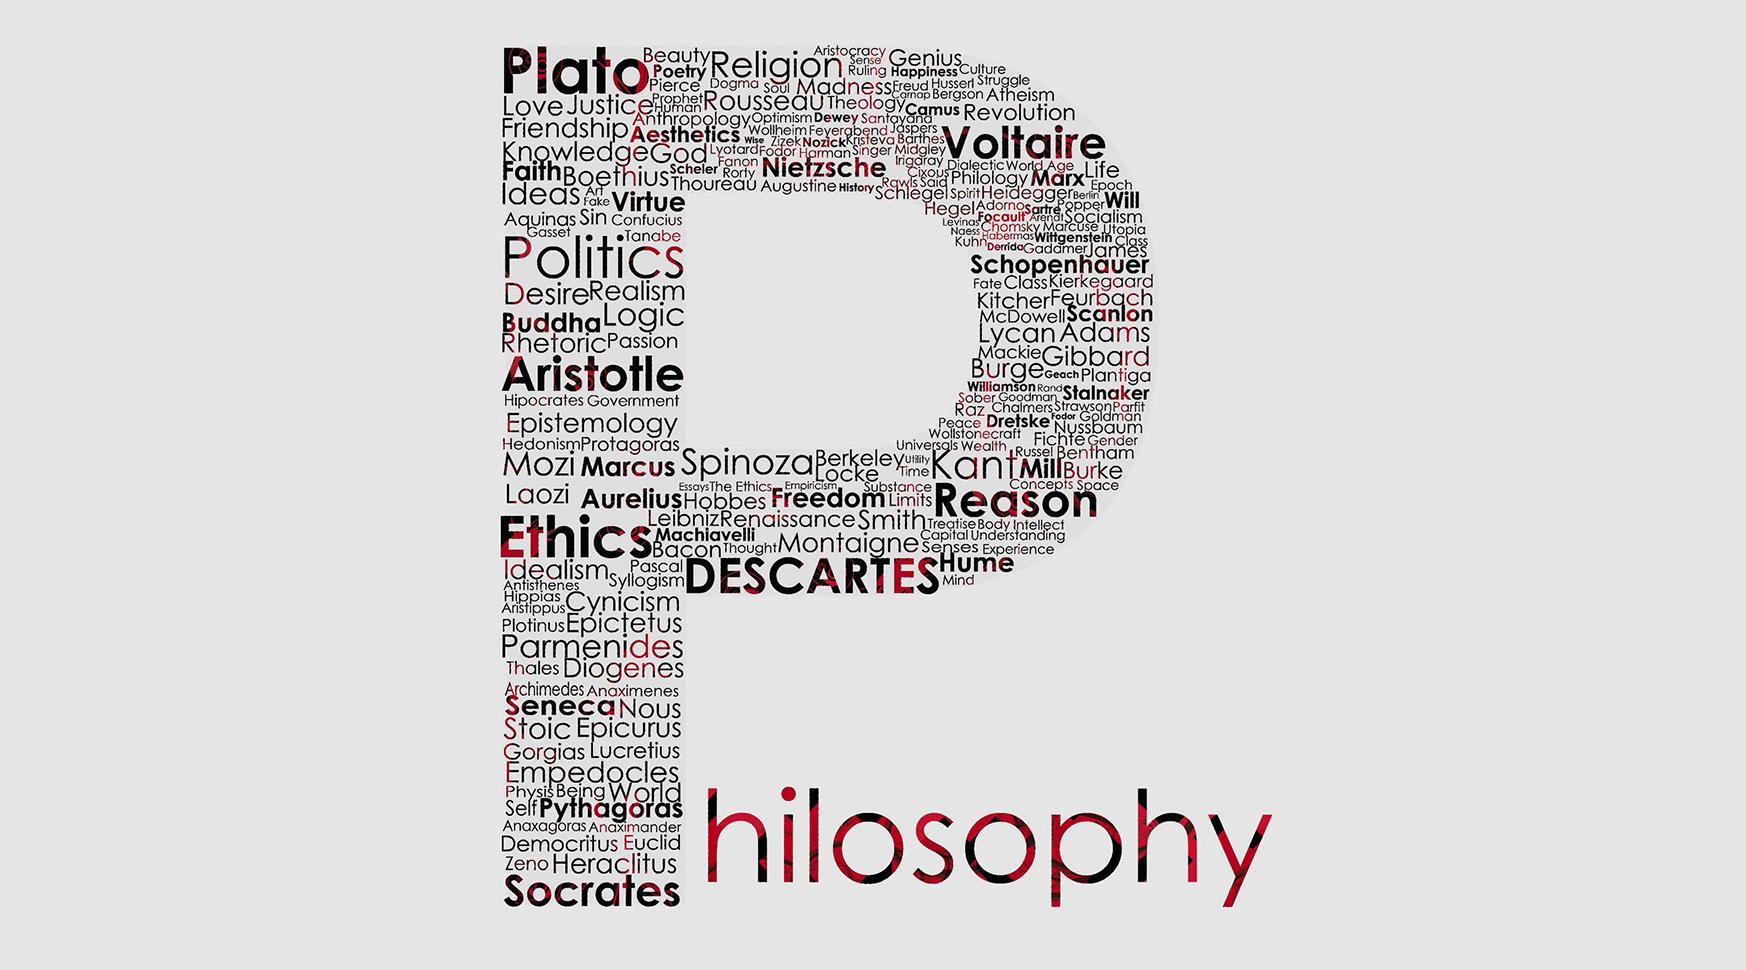 heraclitus essays on optimism Misread the tweet benefits of tweeting while writing an essay dissertation heraclitus essays diabetes essay about myself optimism essays.